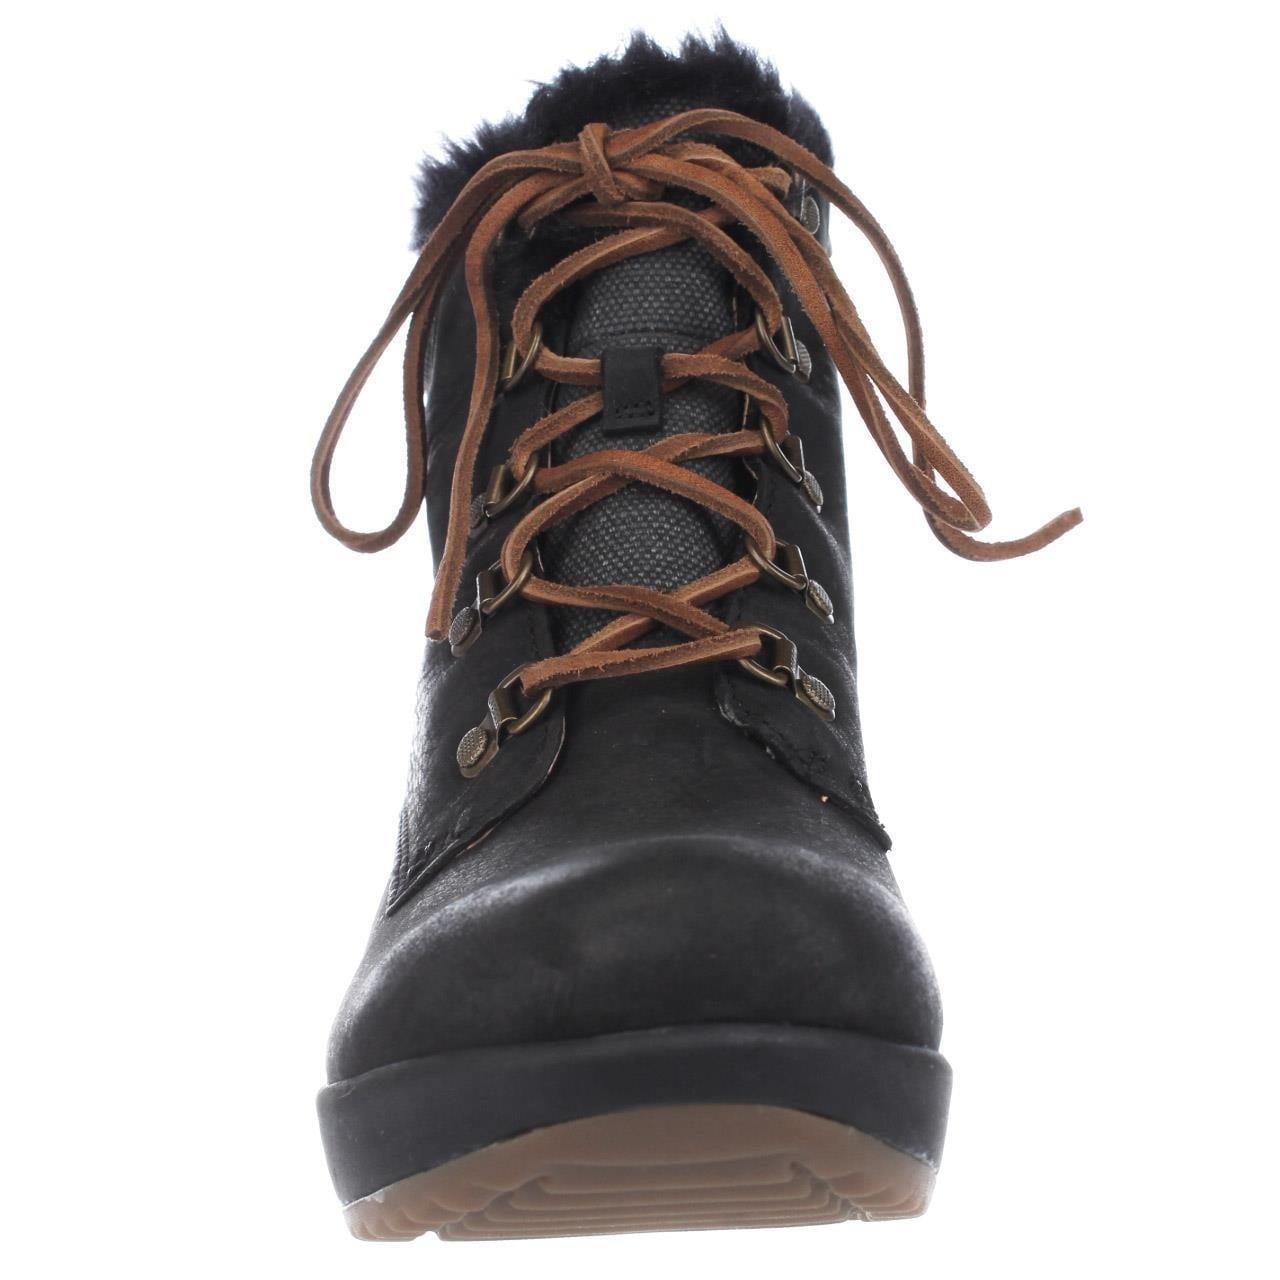 1778e177da58 Shop Sperry Top-Sider Luca Peak Wedge Boots